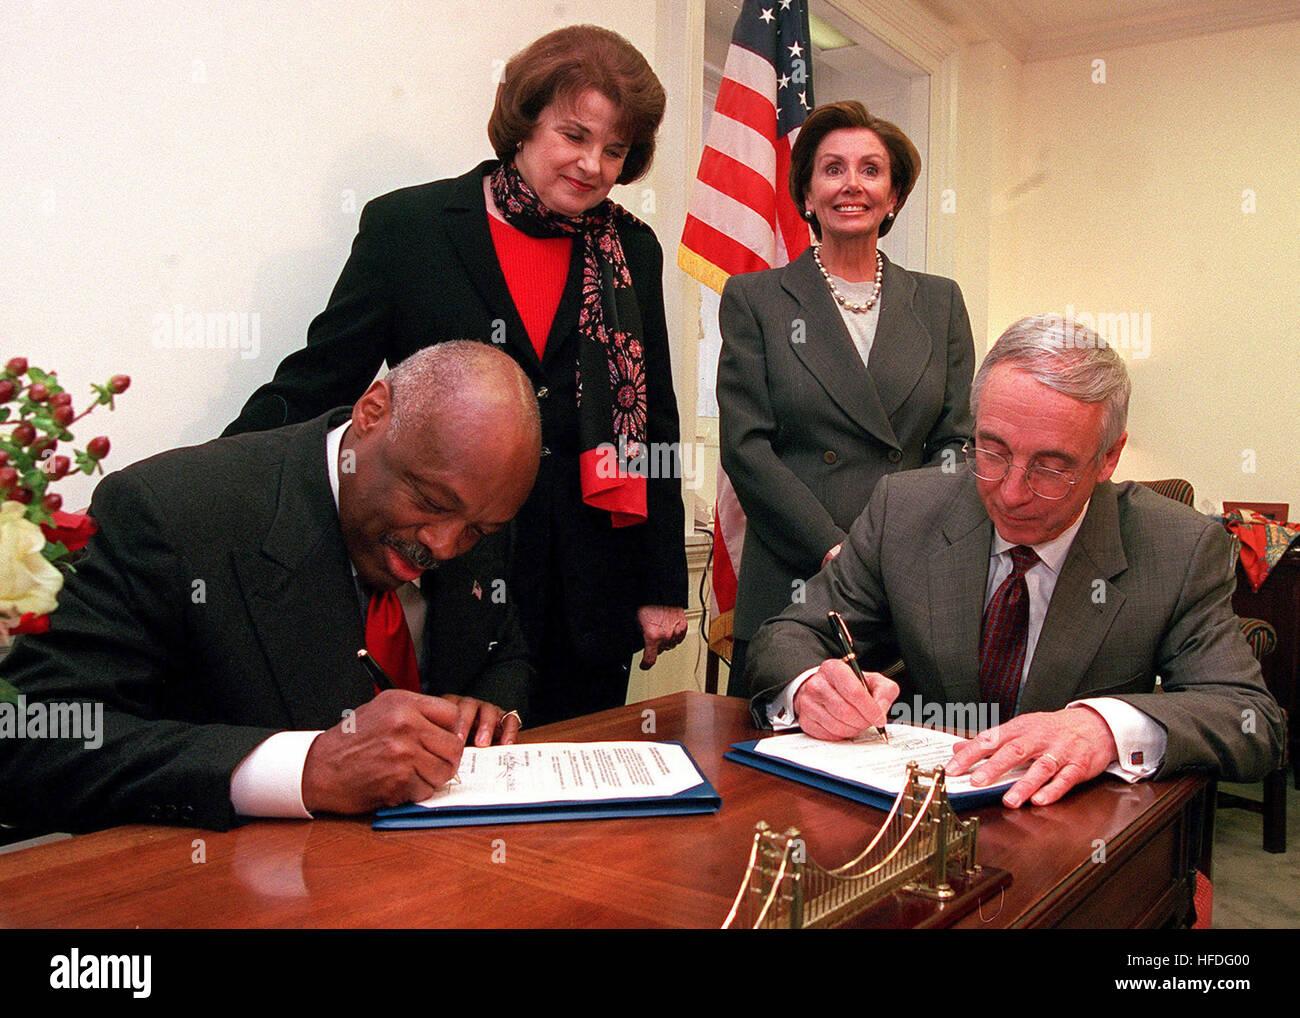 020123-N-5636P-001 Capitol Hill, Washington, D.C. (Jan. 23, 2002) -- Secretary of the Navy the Honorable Gordon - Stock Image